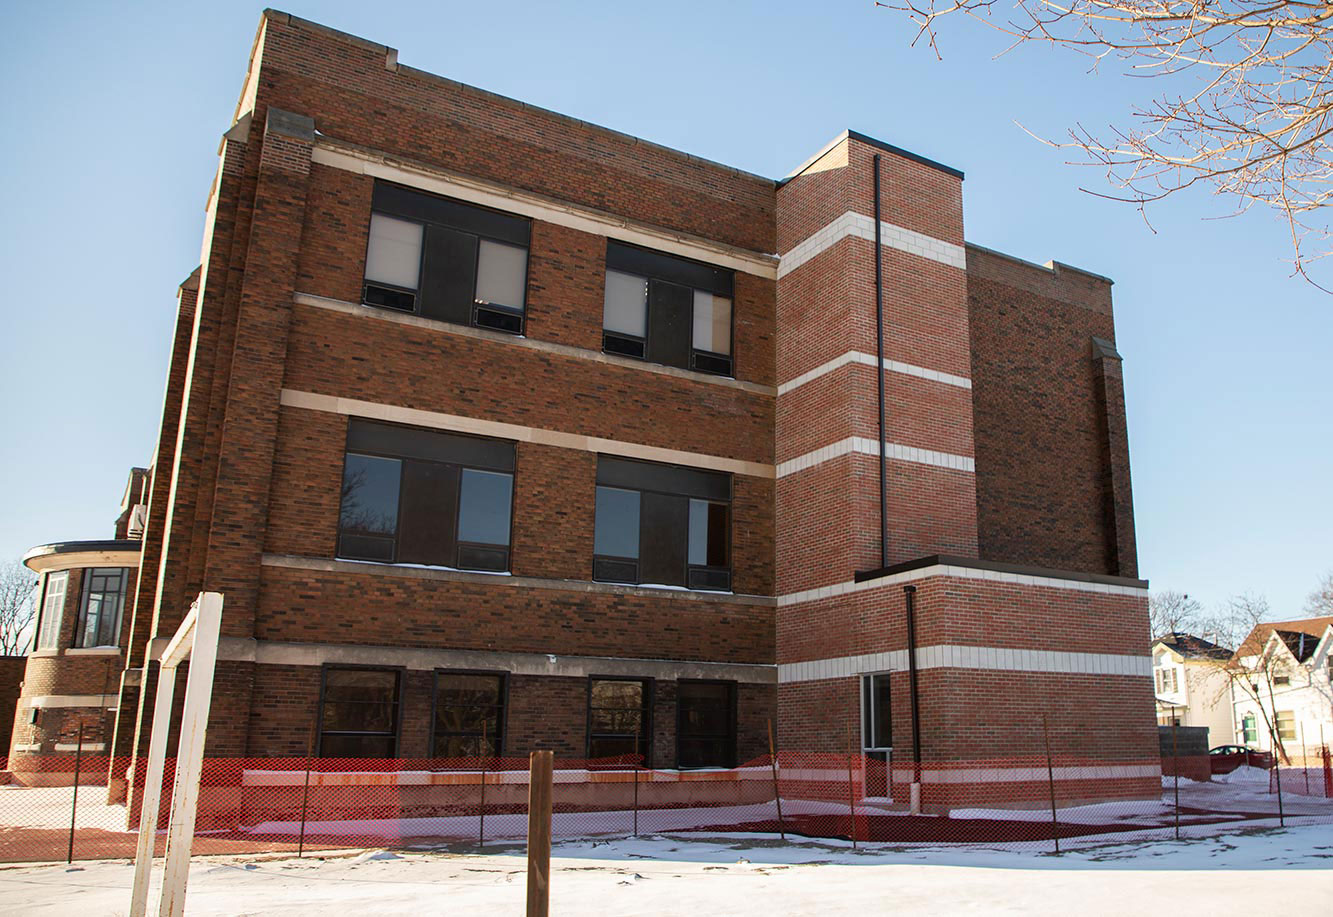 Major Ballachey Elementary School